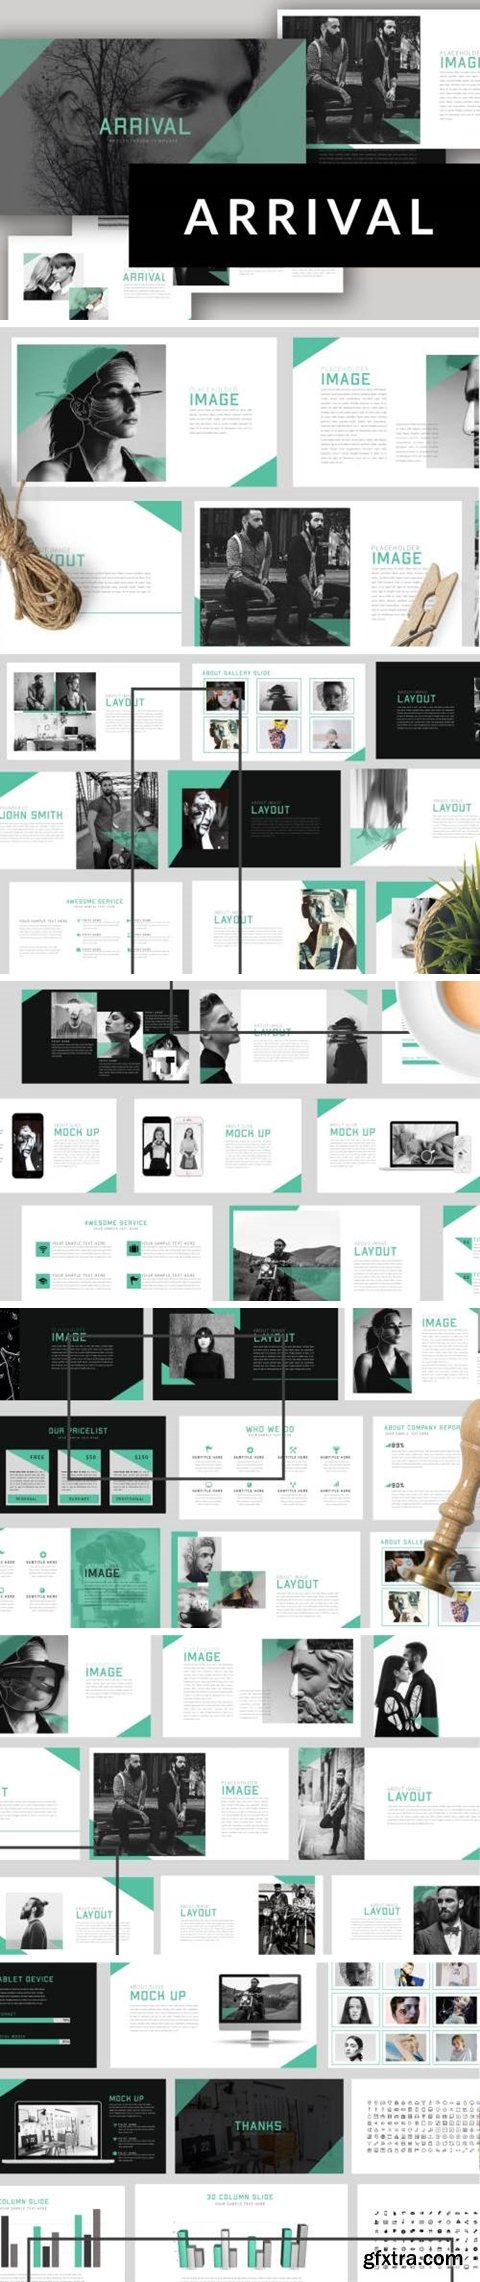 Arrival powerpoint & Keynote Template